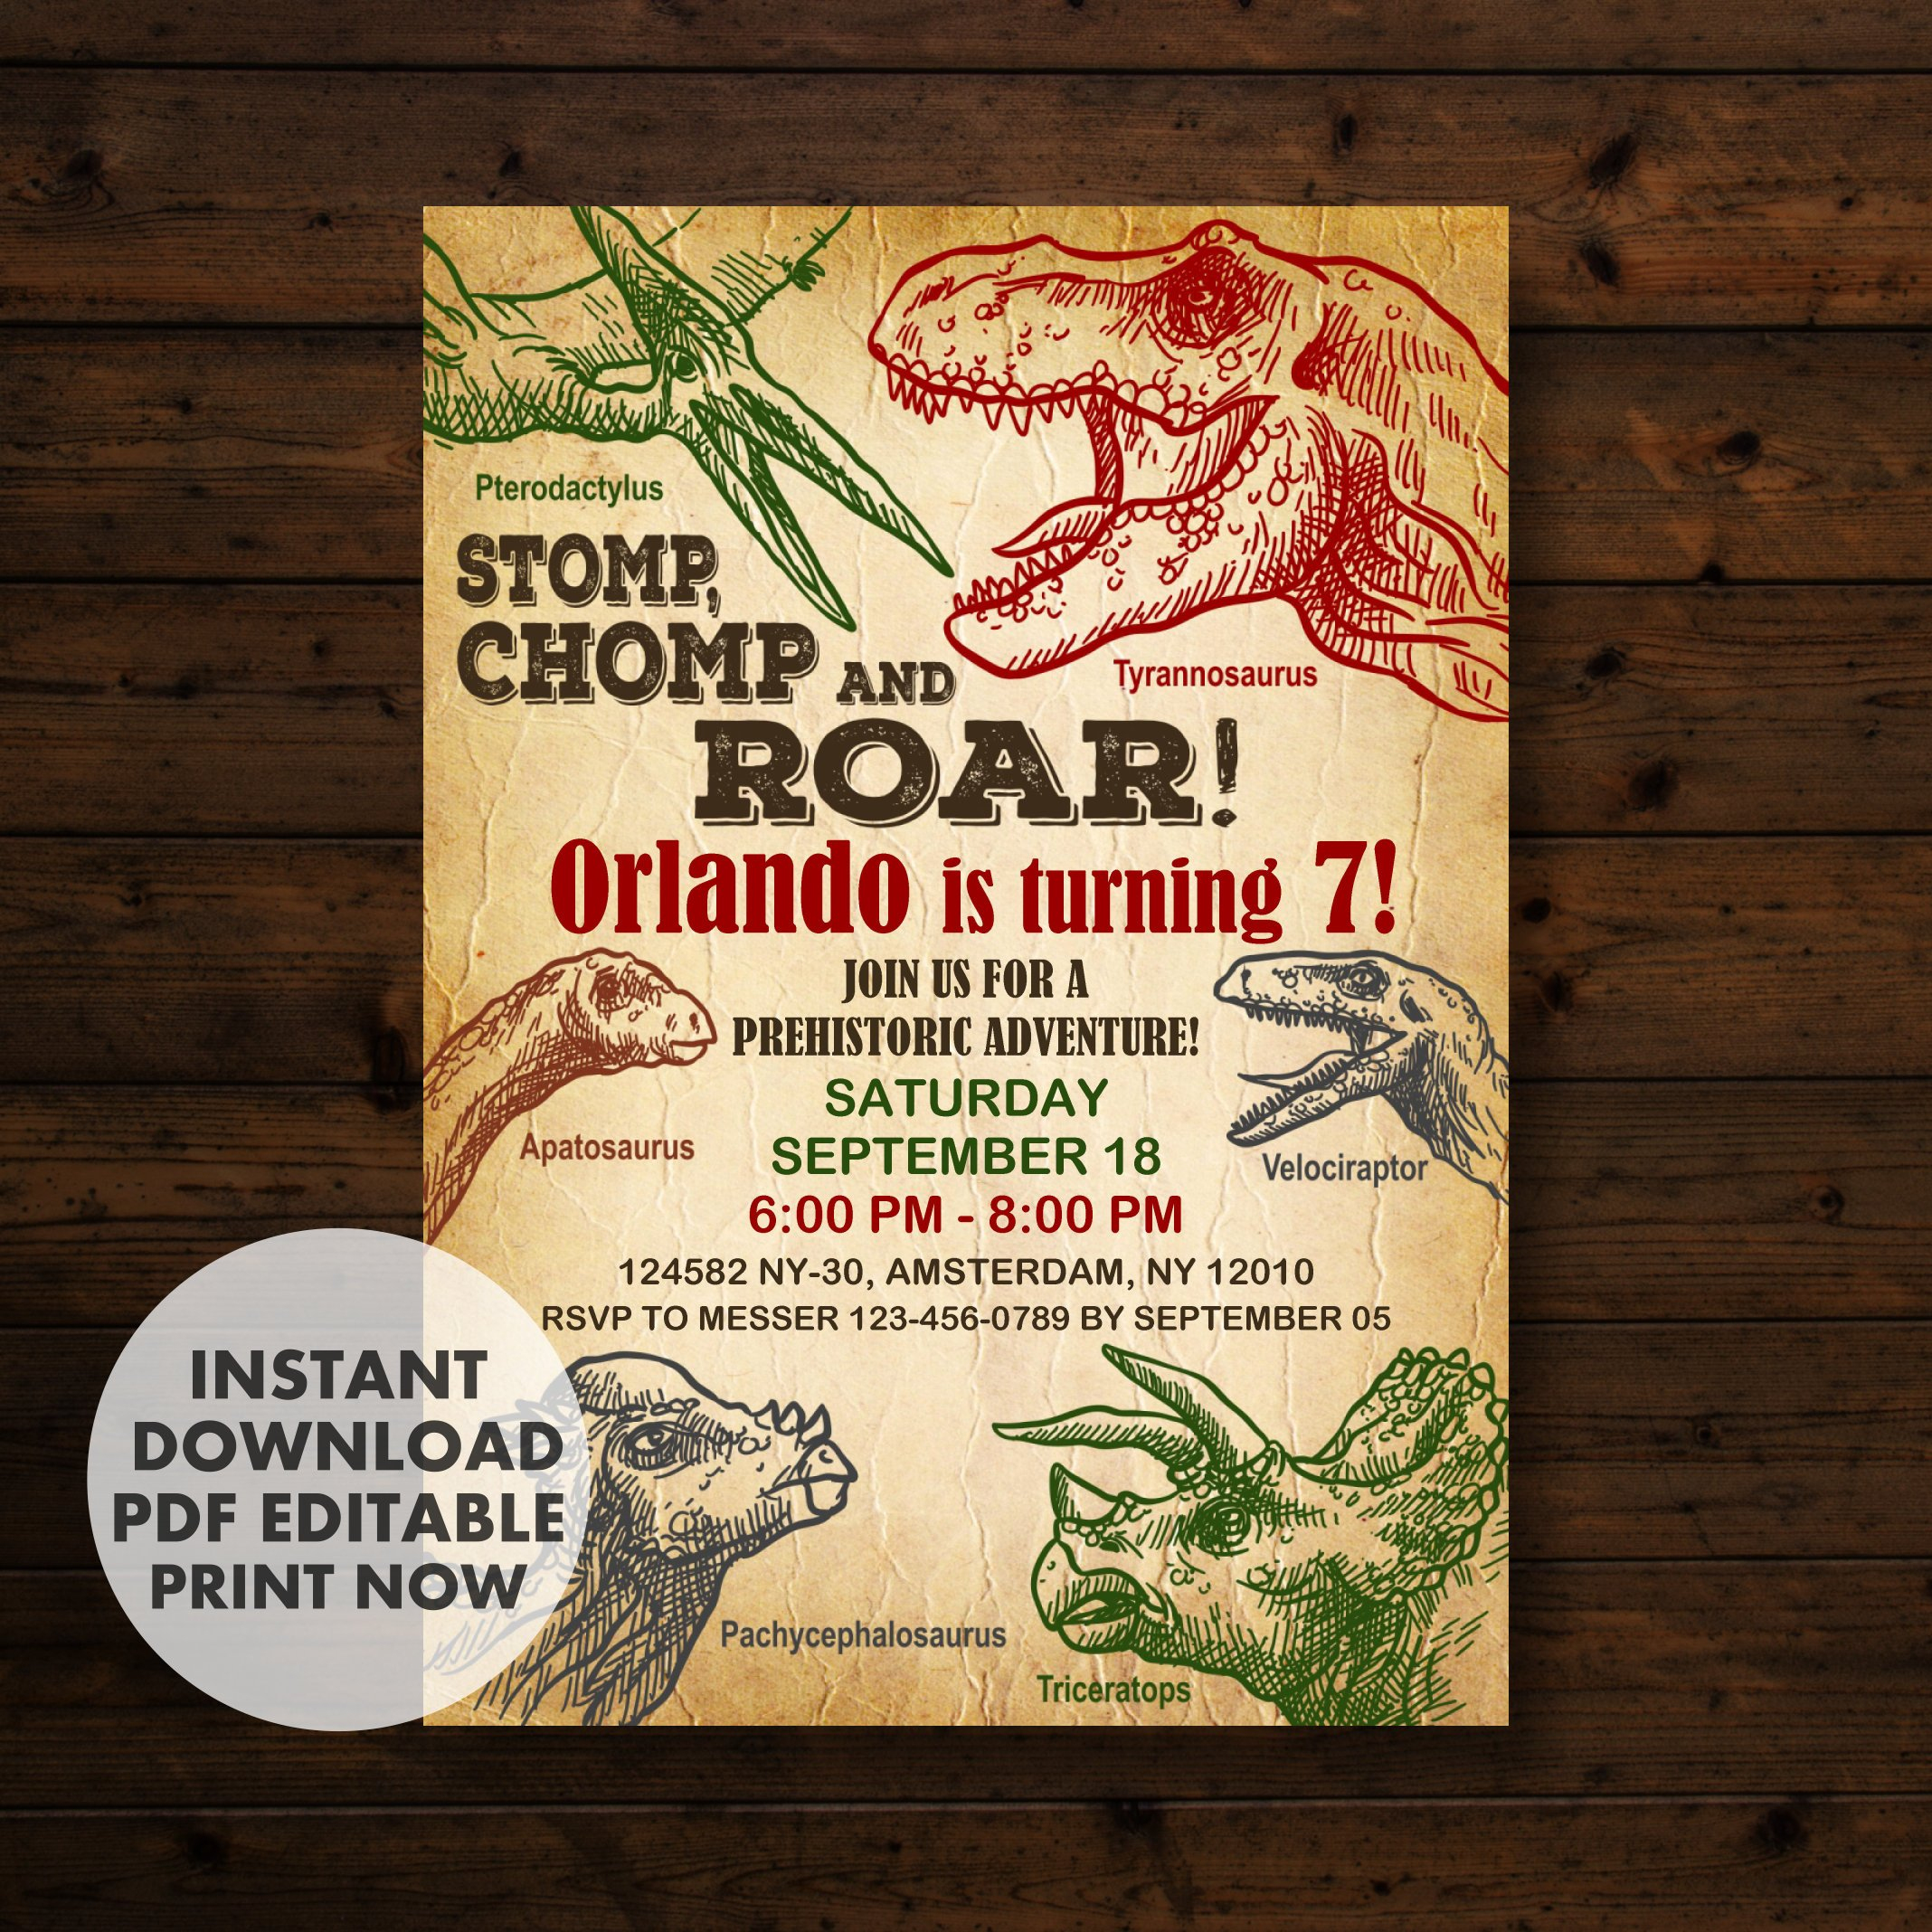 Printable Dinosaur Birthday Invitation Template - Epic Party Ideas - Free Printable Dinosaur Birthday Invitations